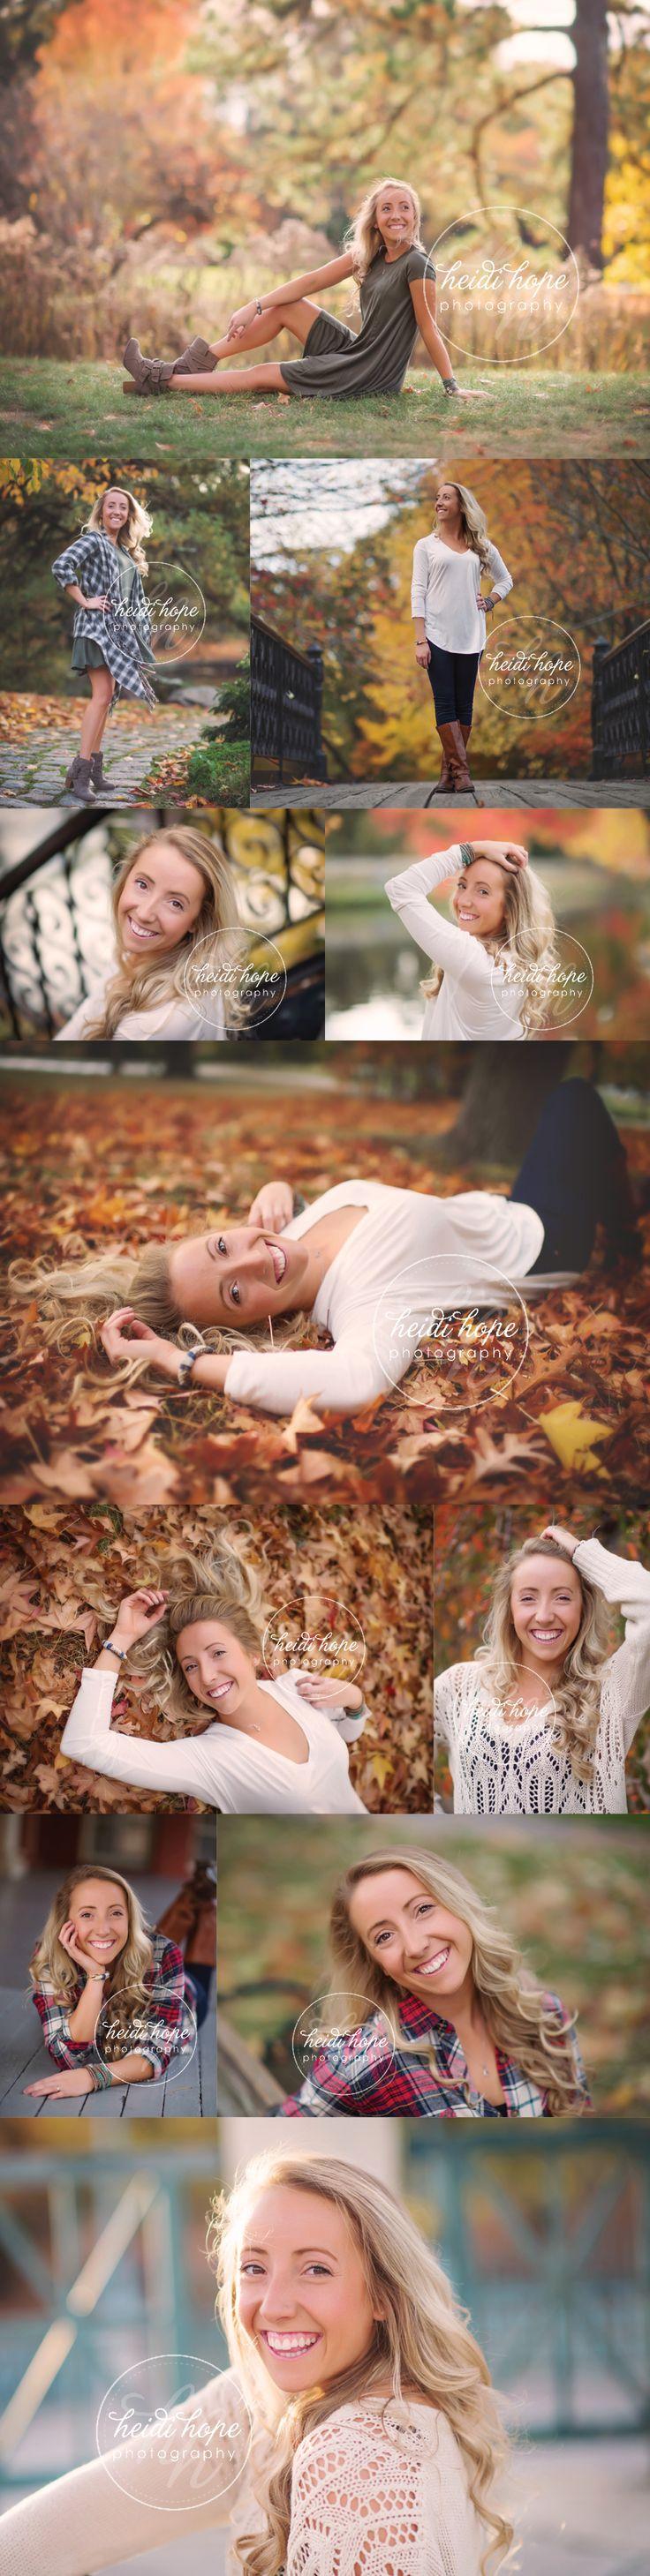 Senior Portraits | Heidi Hope Photography